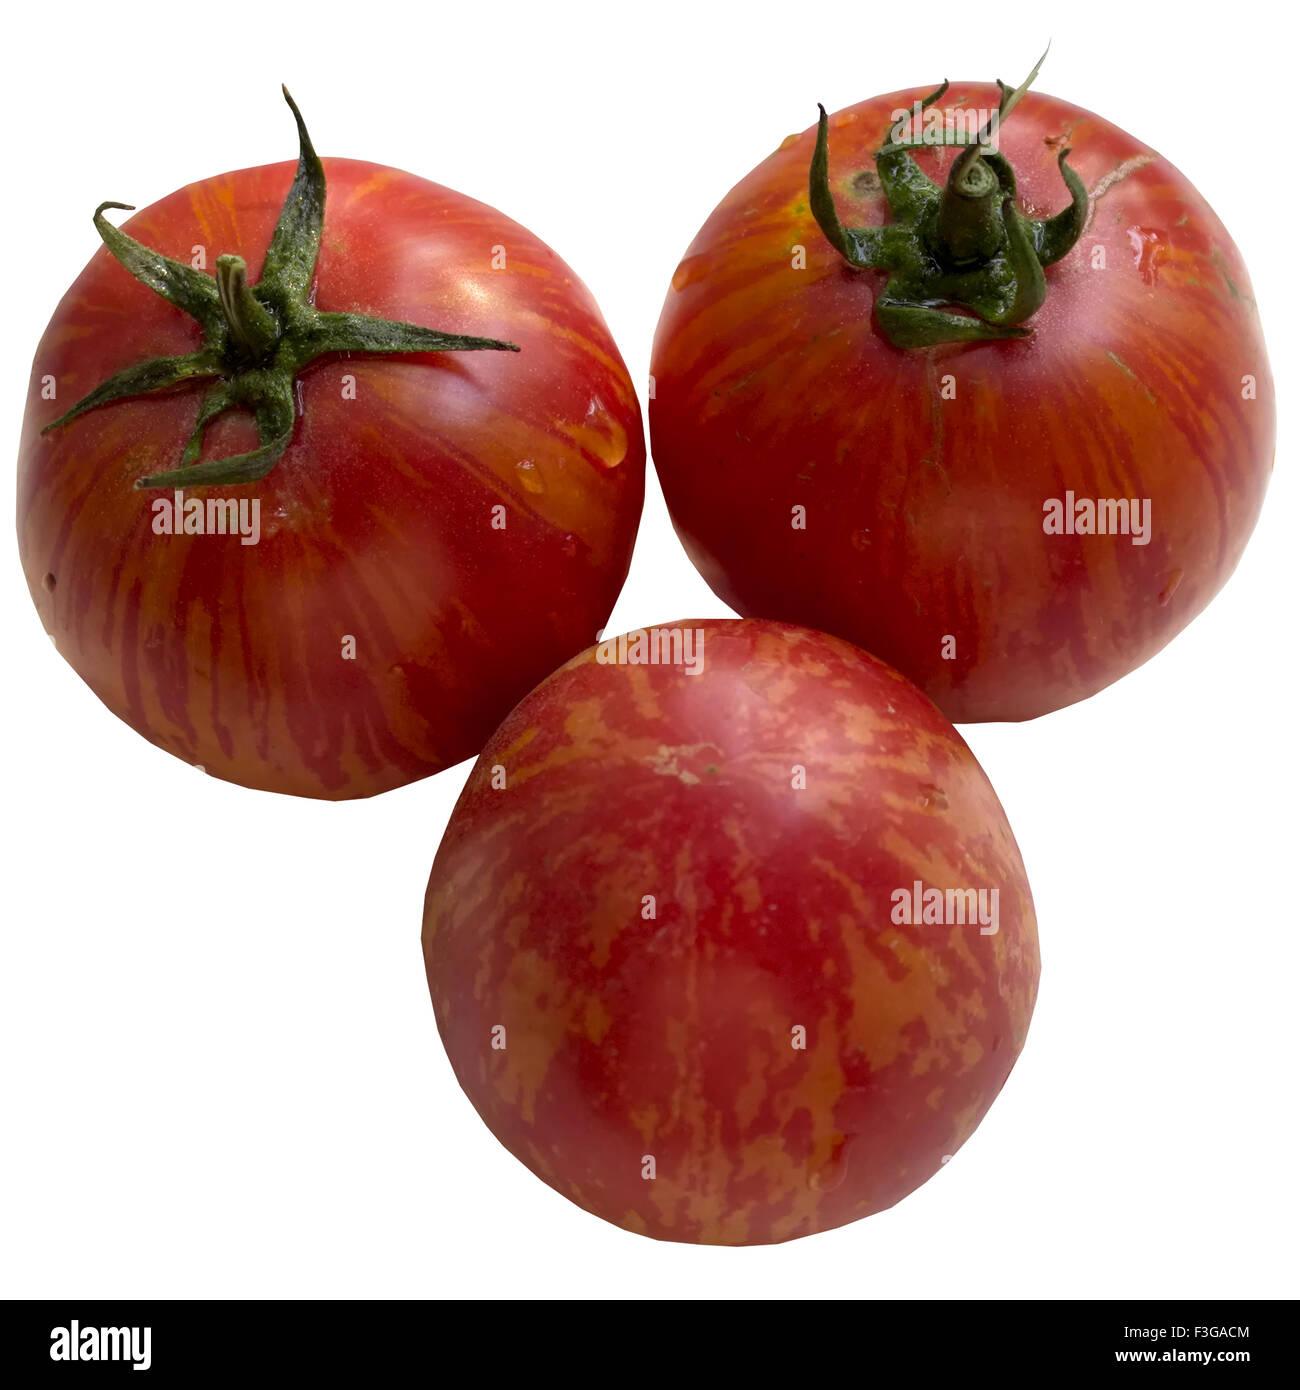 Arrière-plan lumineux, harvest, tomate, mûr, frais, jardinage, produit, naturel, tomate. Photo Stock